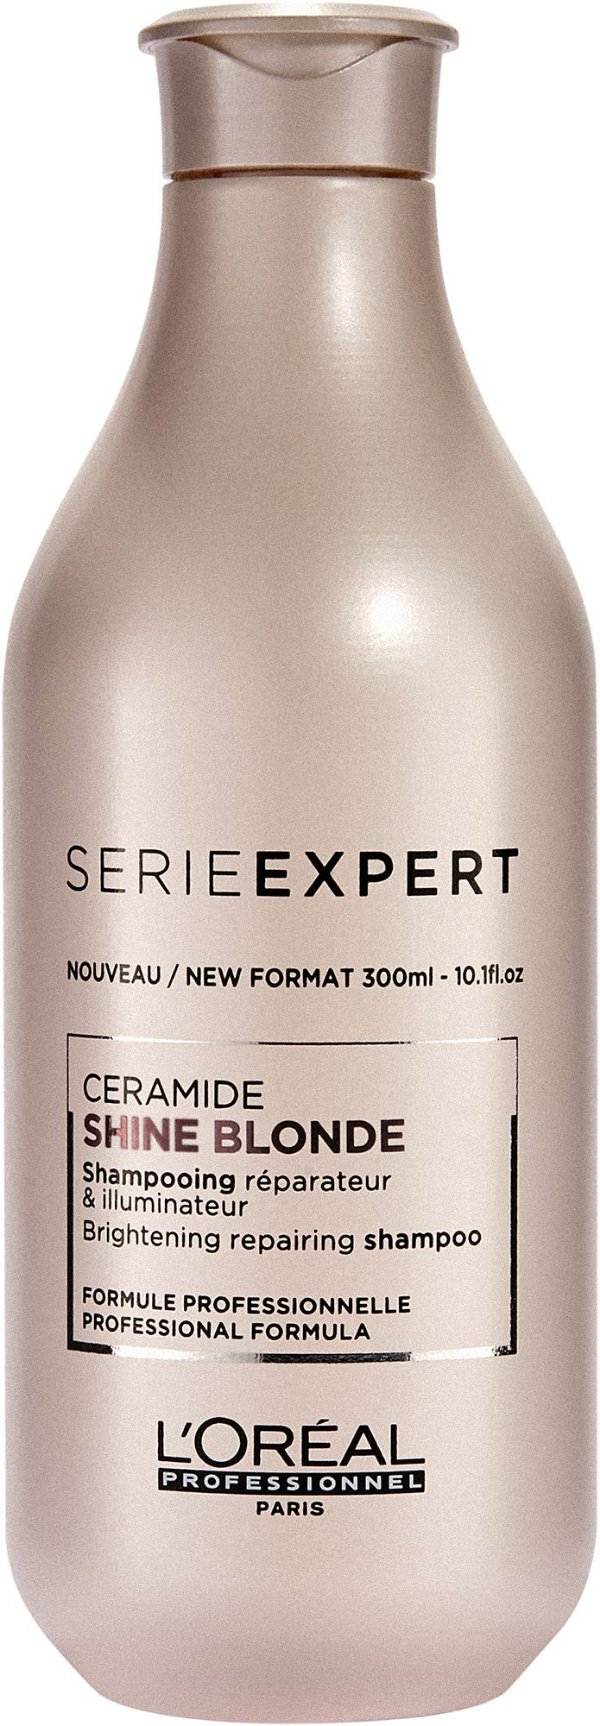 L'Oréal Professionnel Shine Blonde - Shampoo 300ml